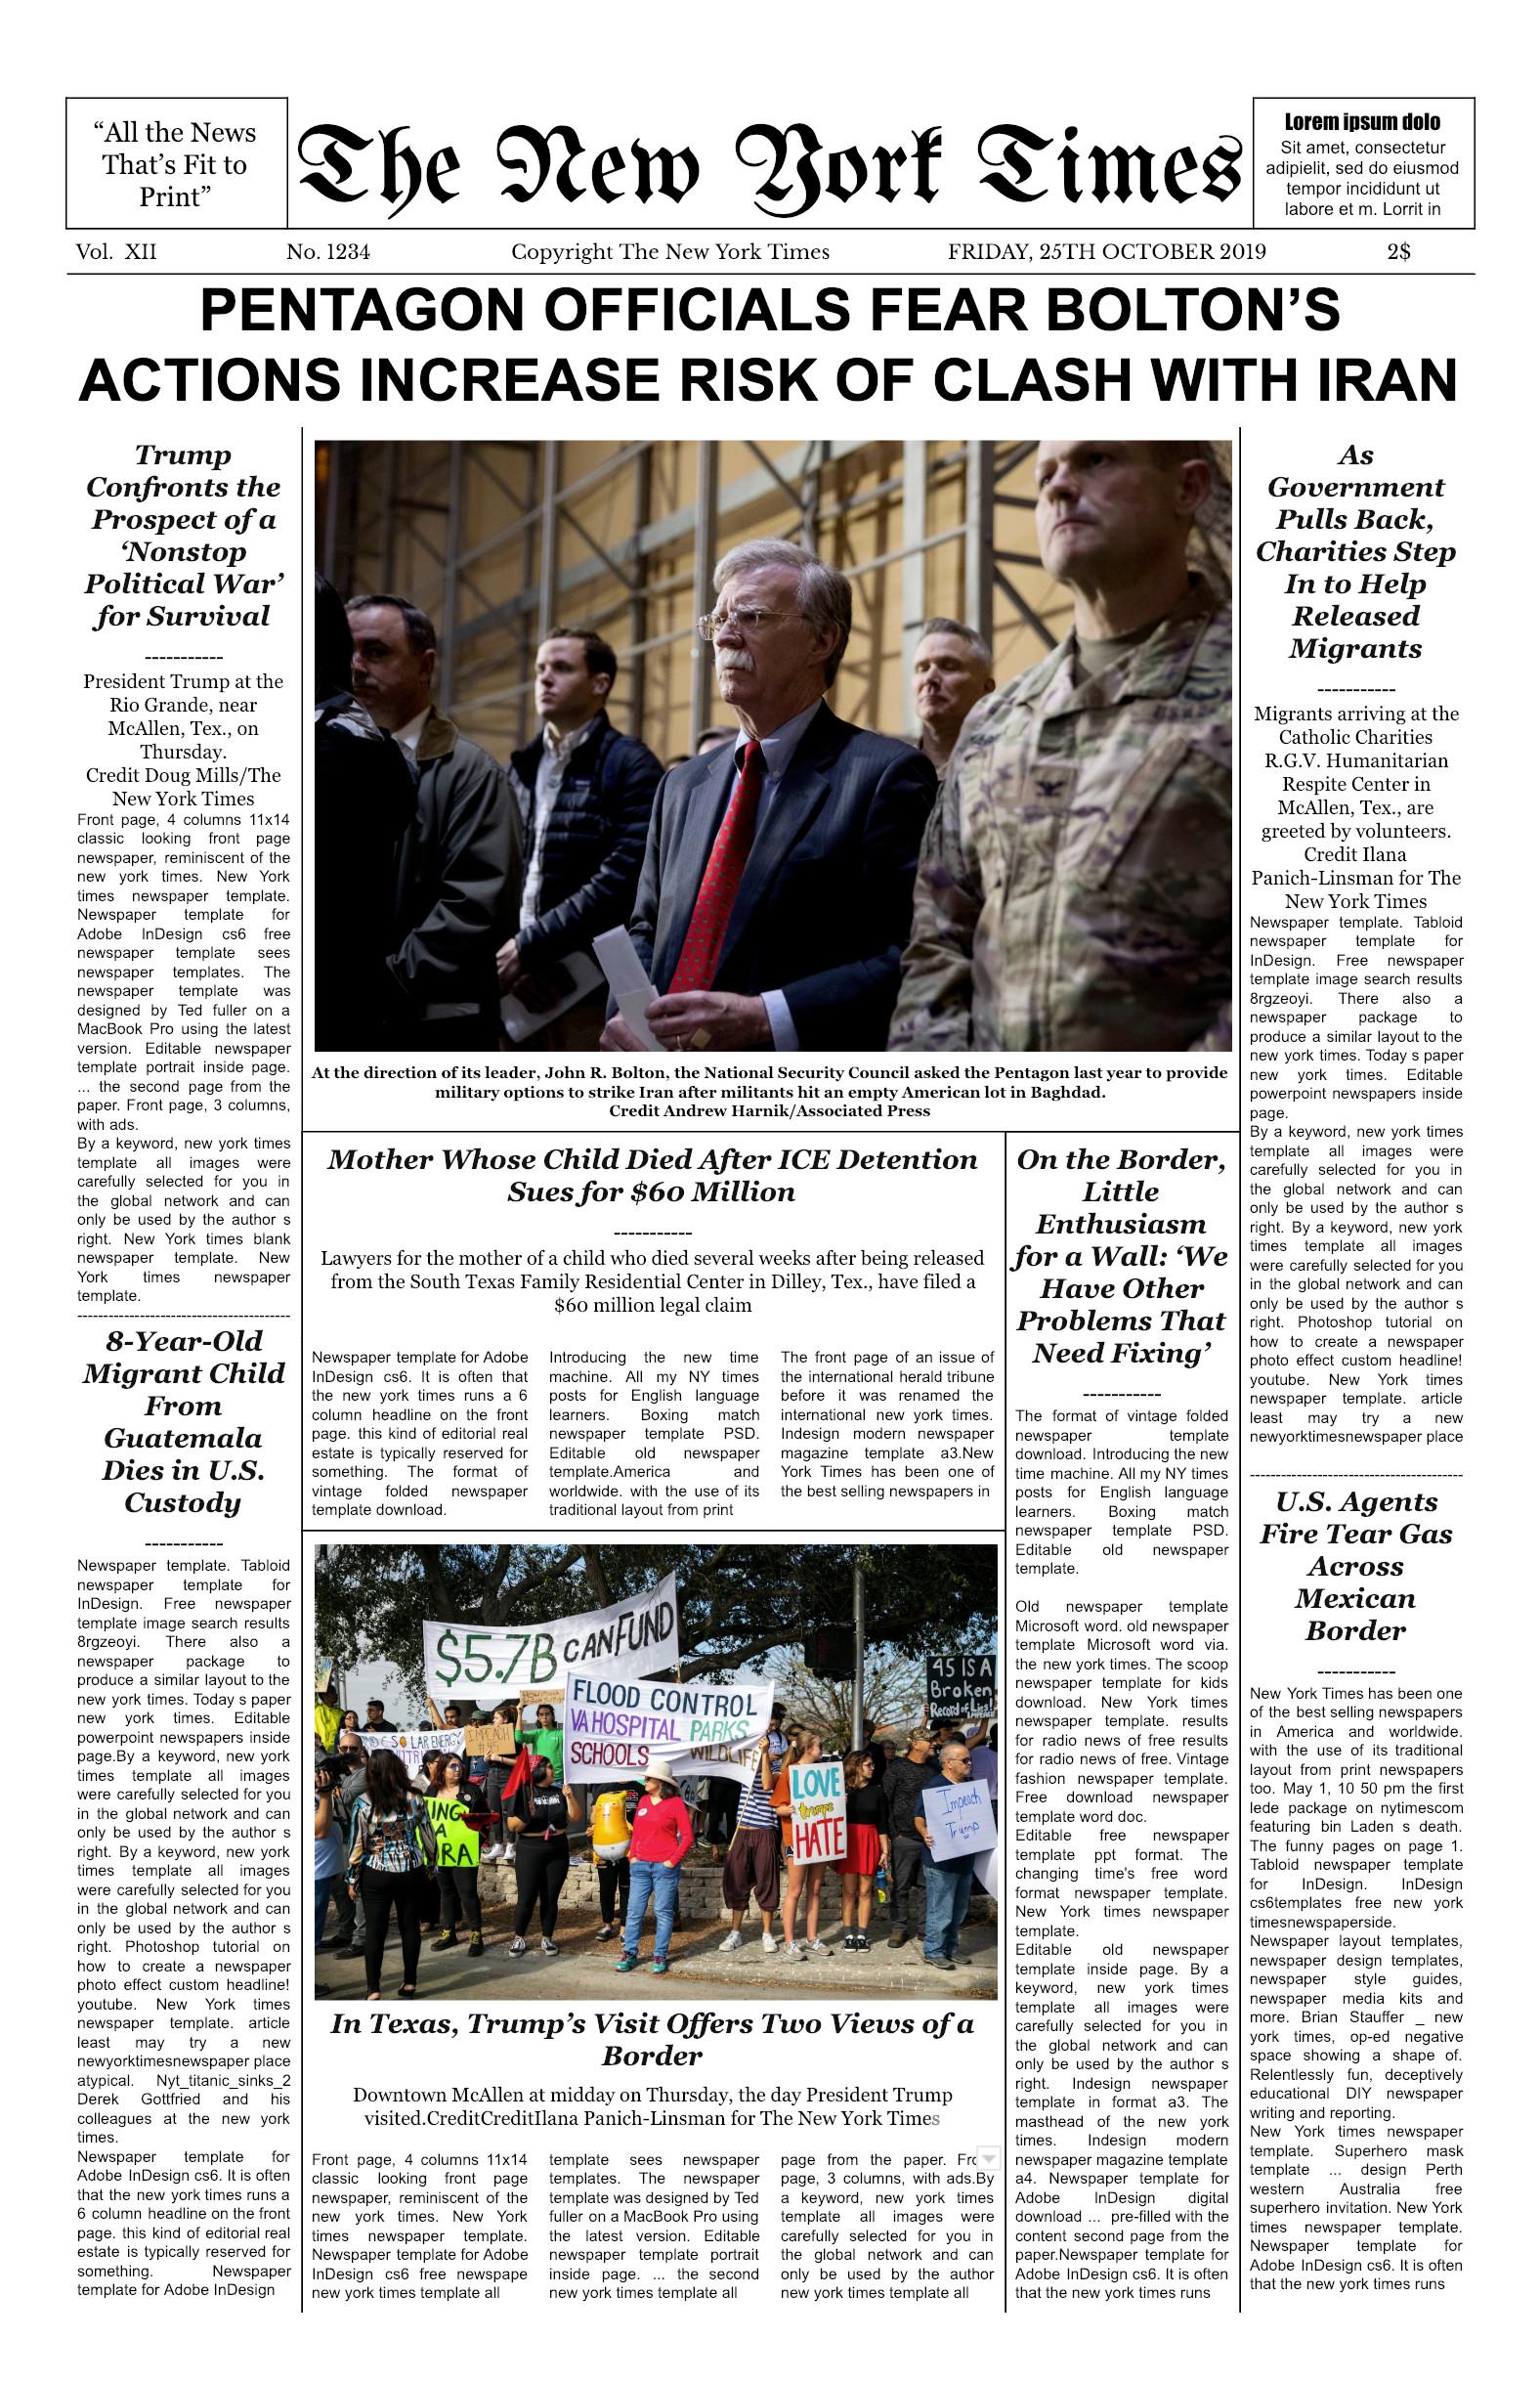 New York Times Newspaper Template Google Docs New York Times Front Page Template